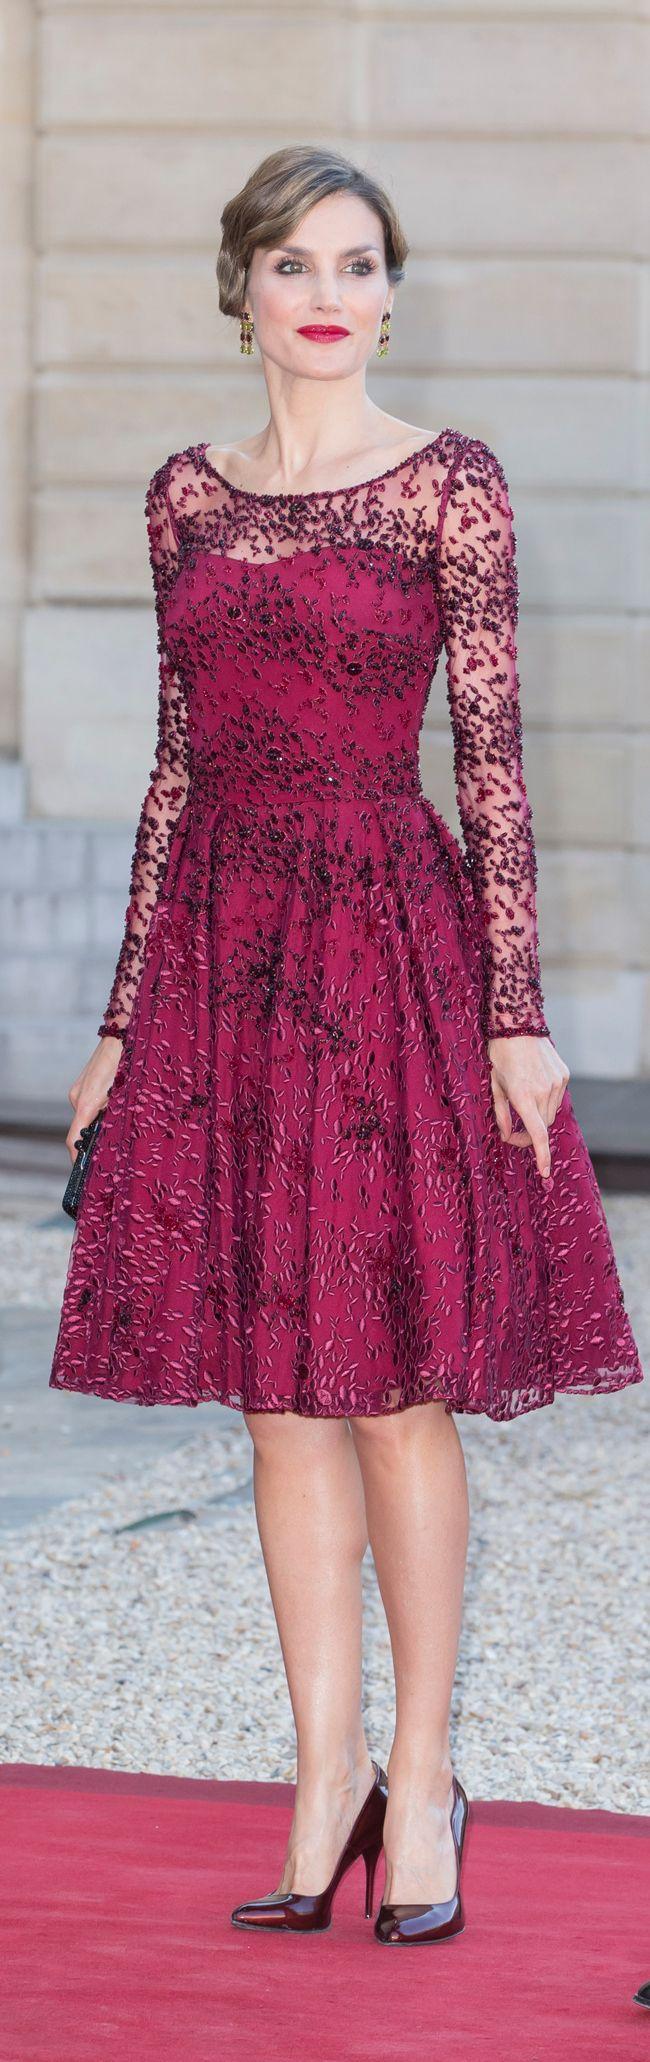 Koningin Letizia | fashion | Pinterest | Reinas, Vestiditos y Reina ...